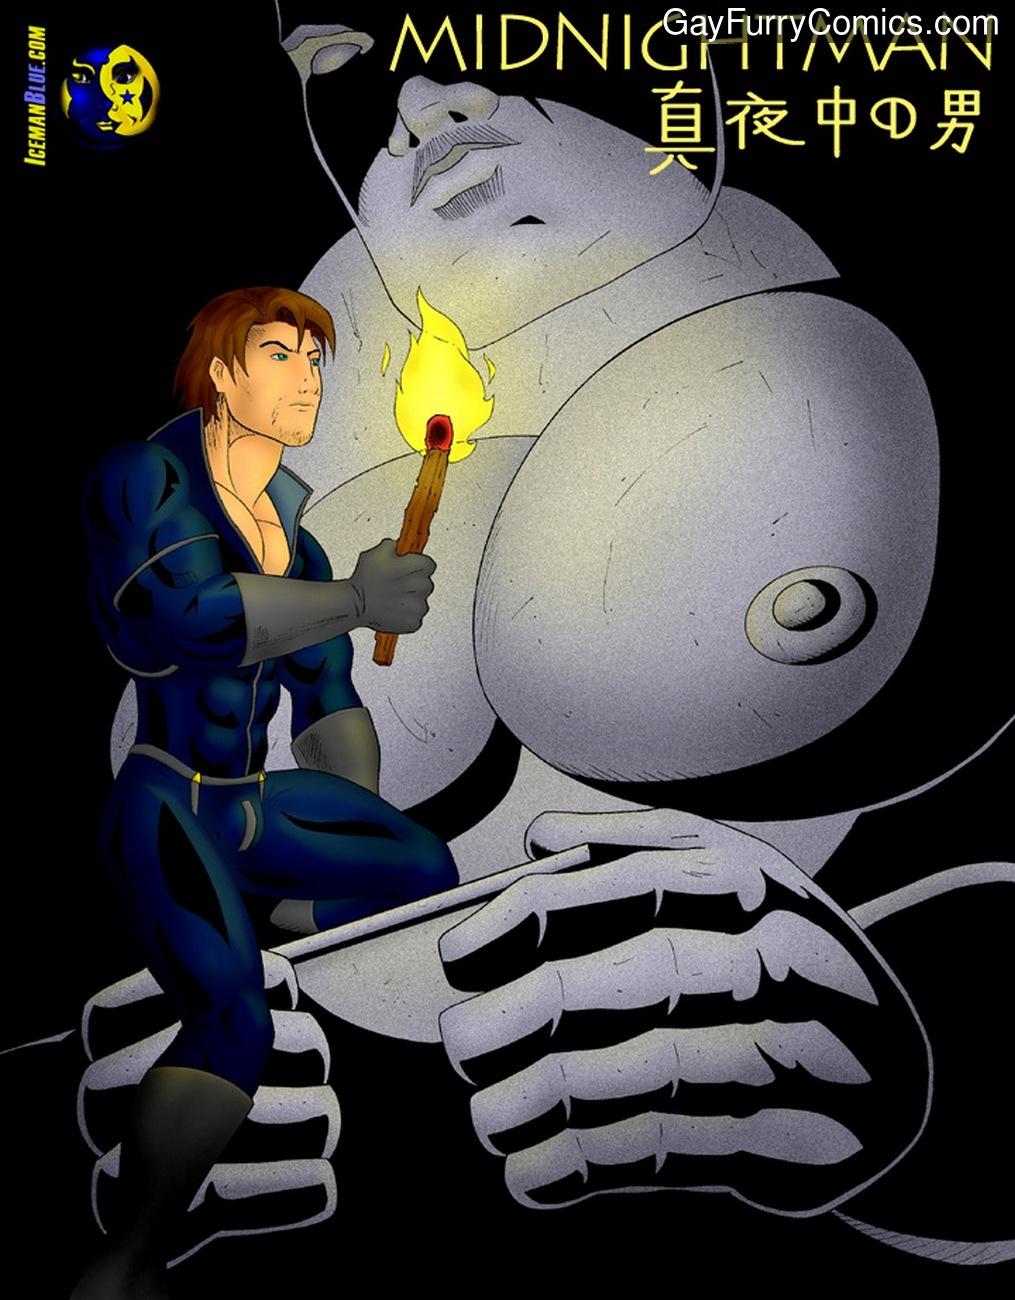 Midnightman 3 gay furry comic